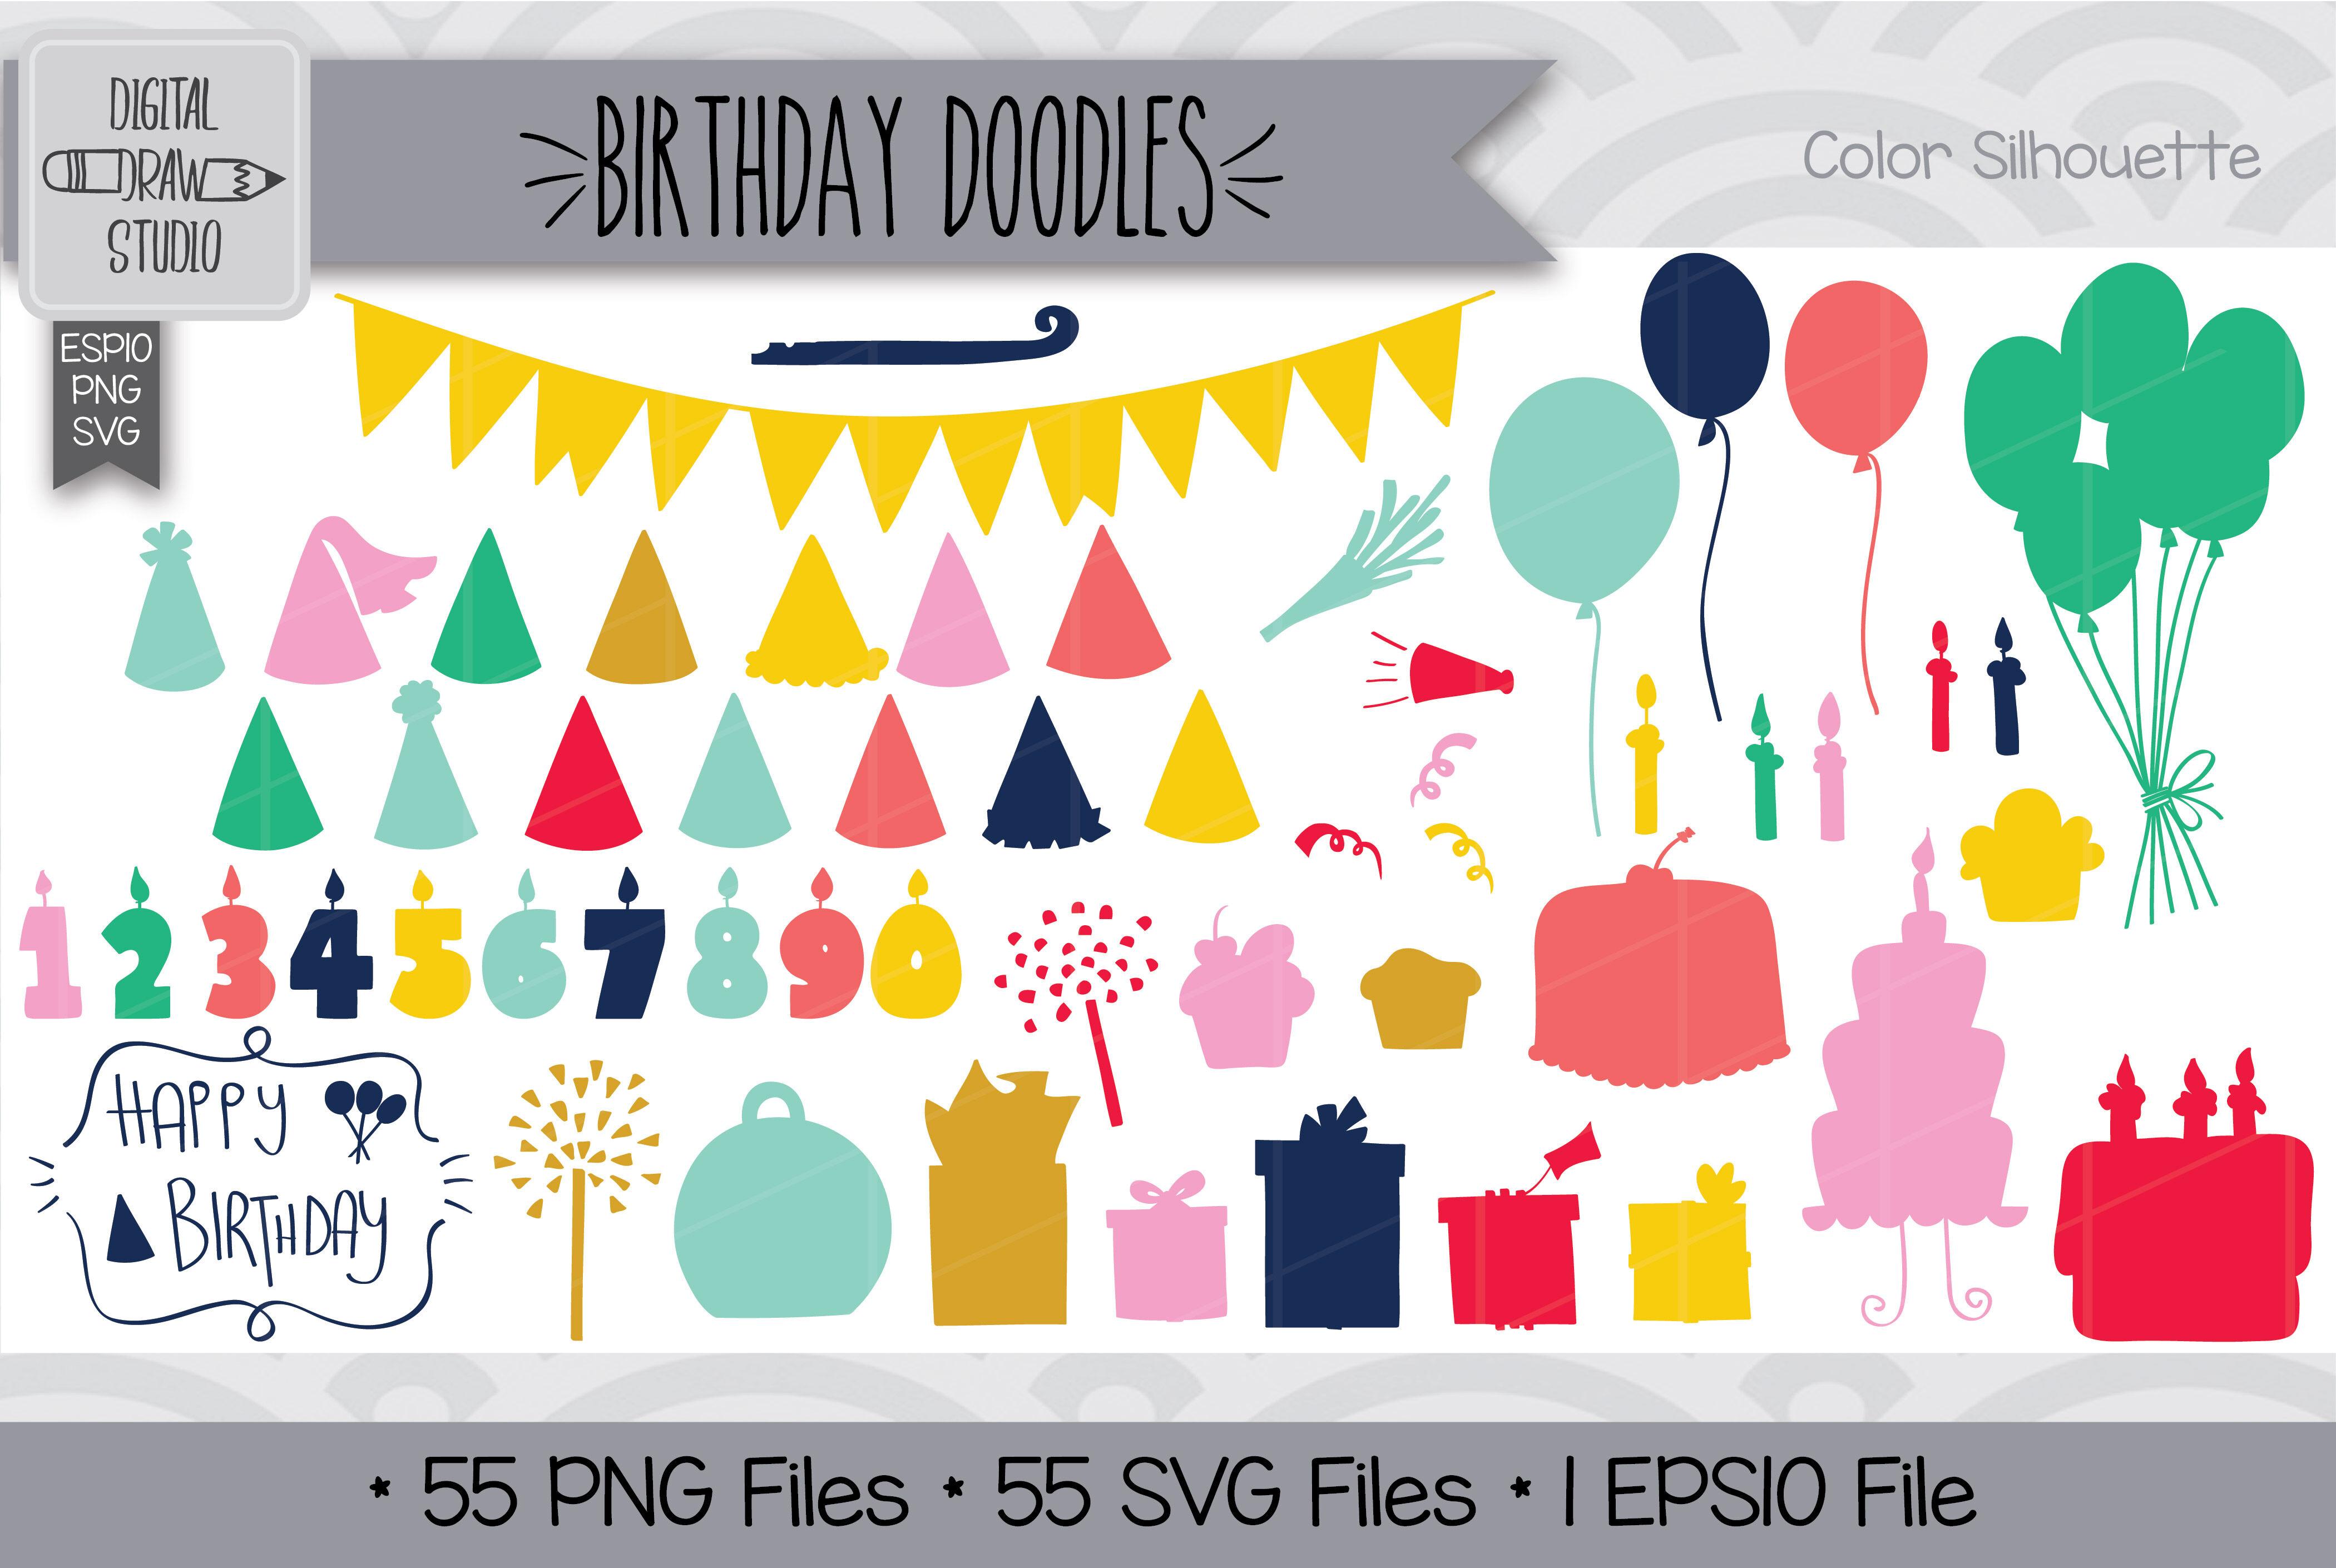 Hand Drawn Birthday Doodles Clip Art Festive Party Illustration